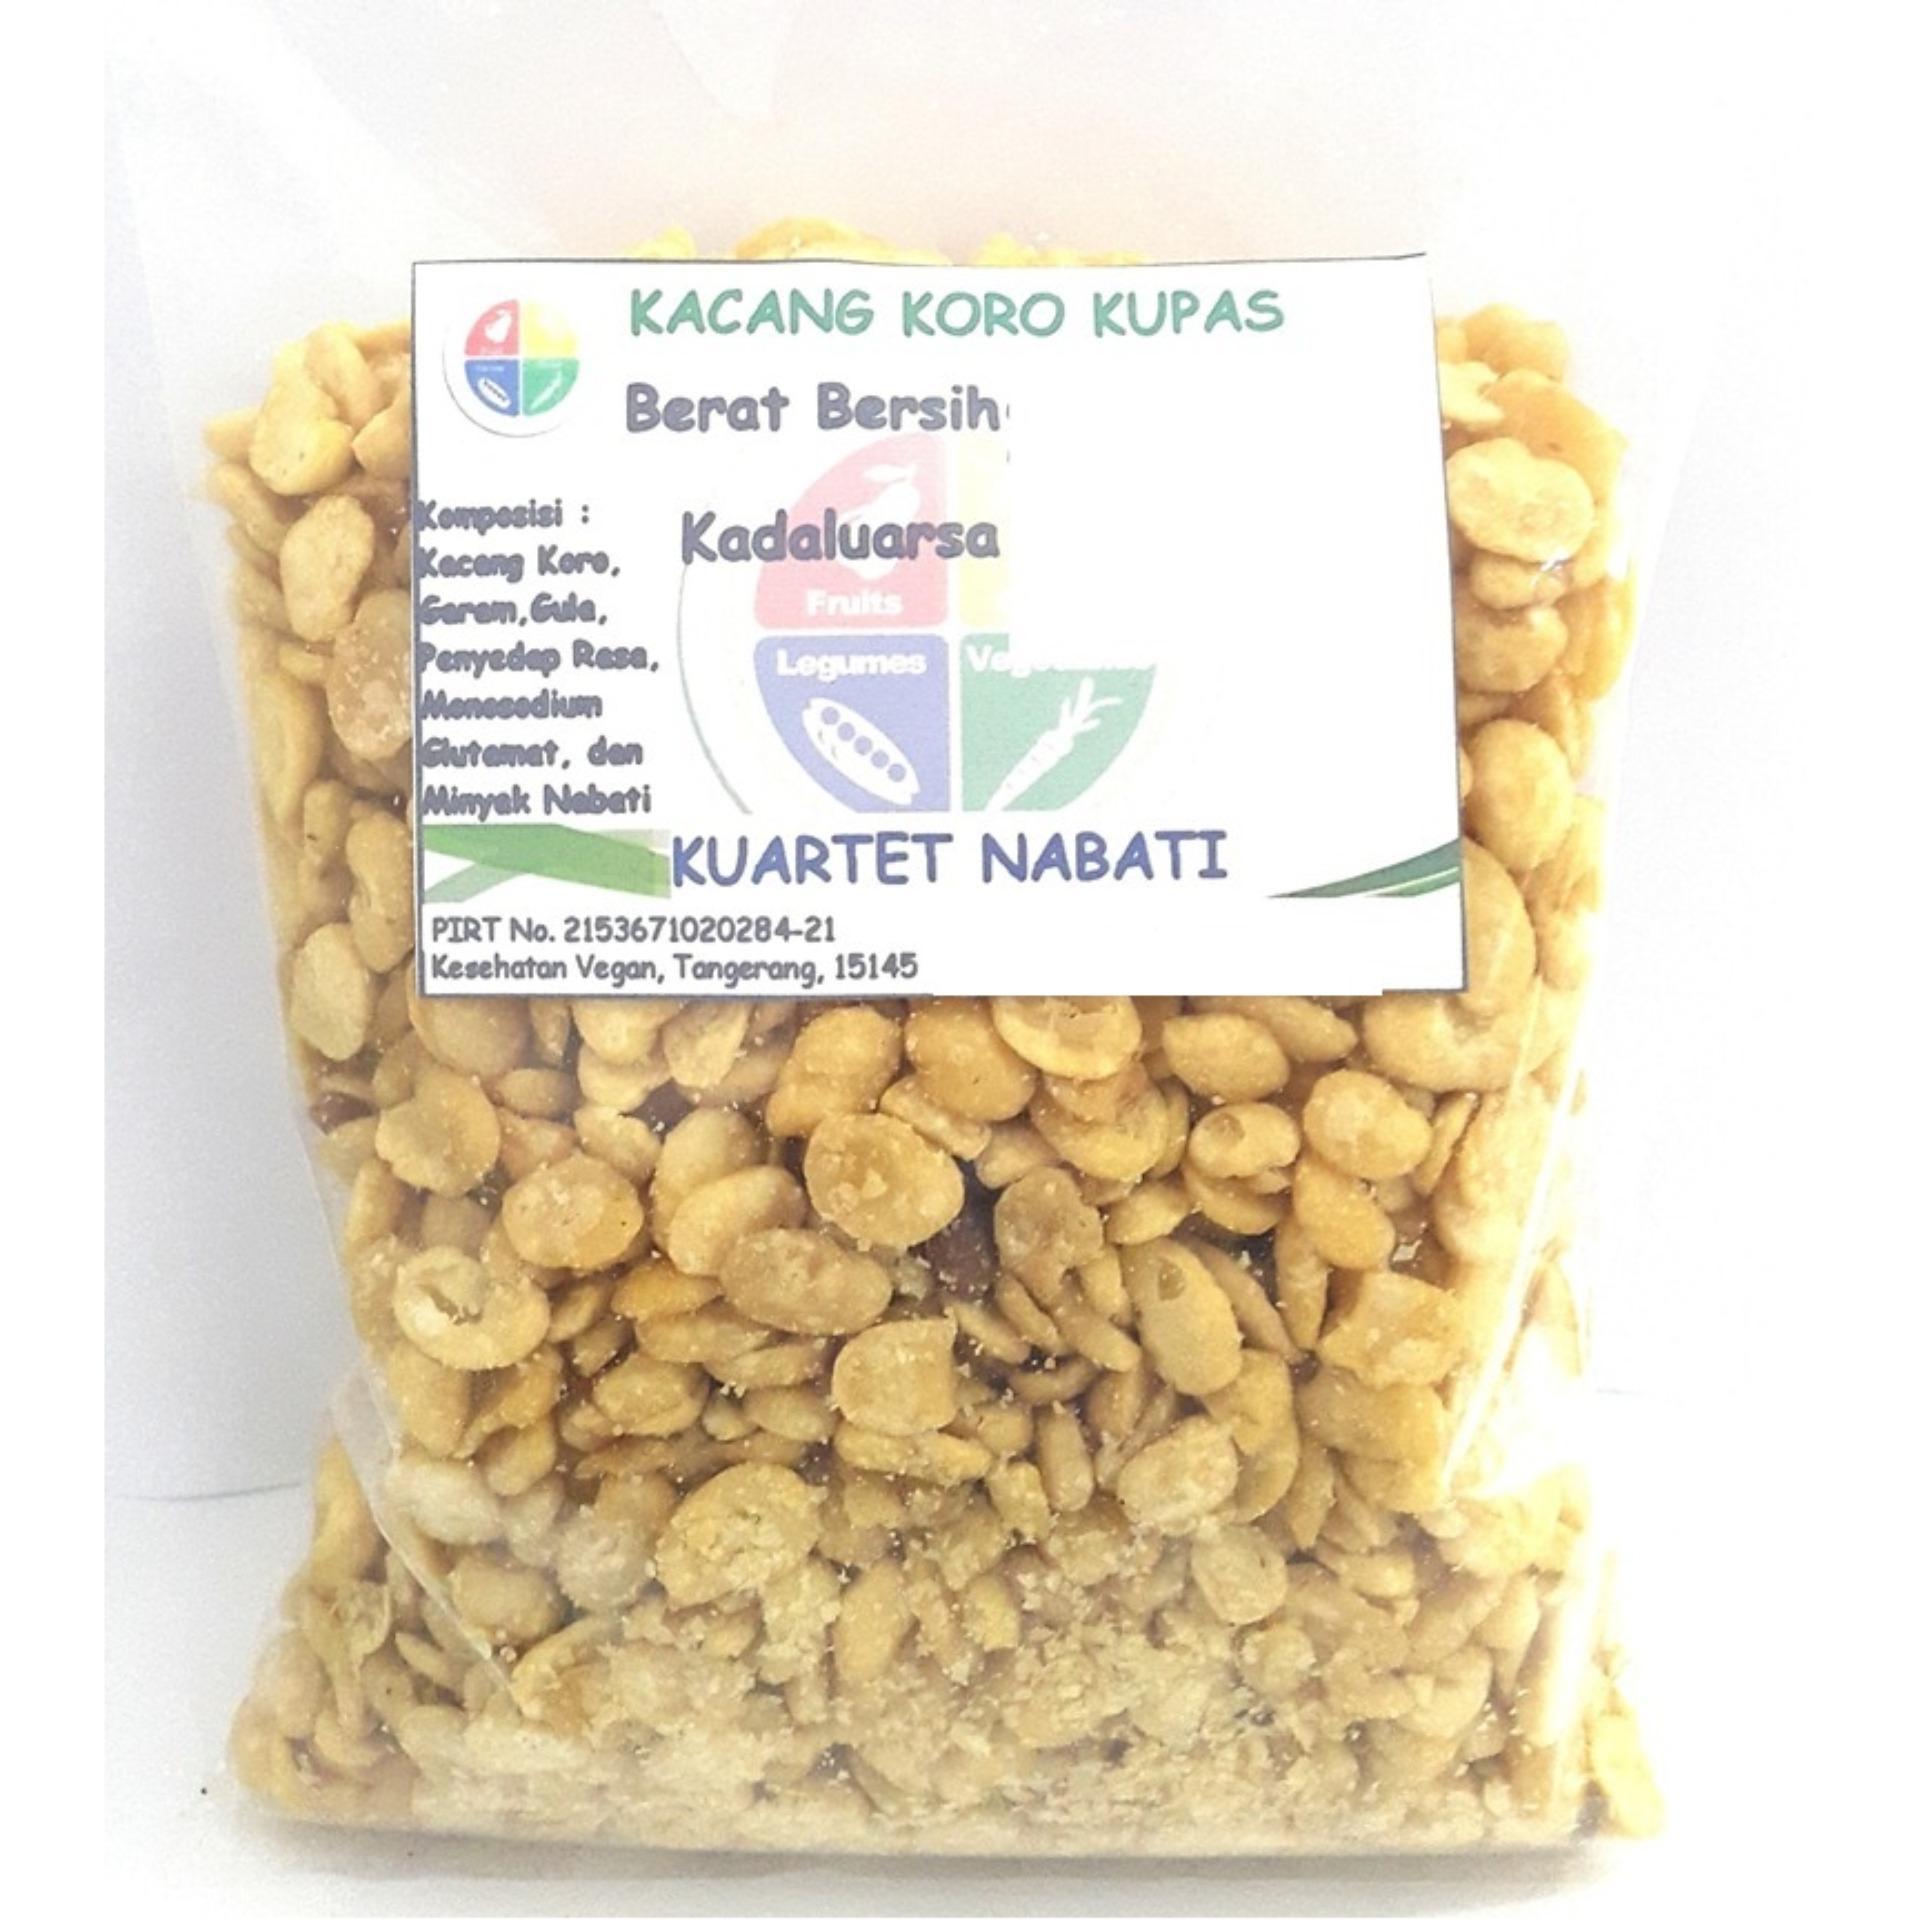 Kuartet Nabati Kacang Koro Kupas (1000 Gr)